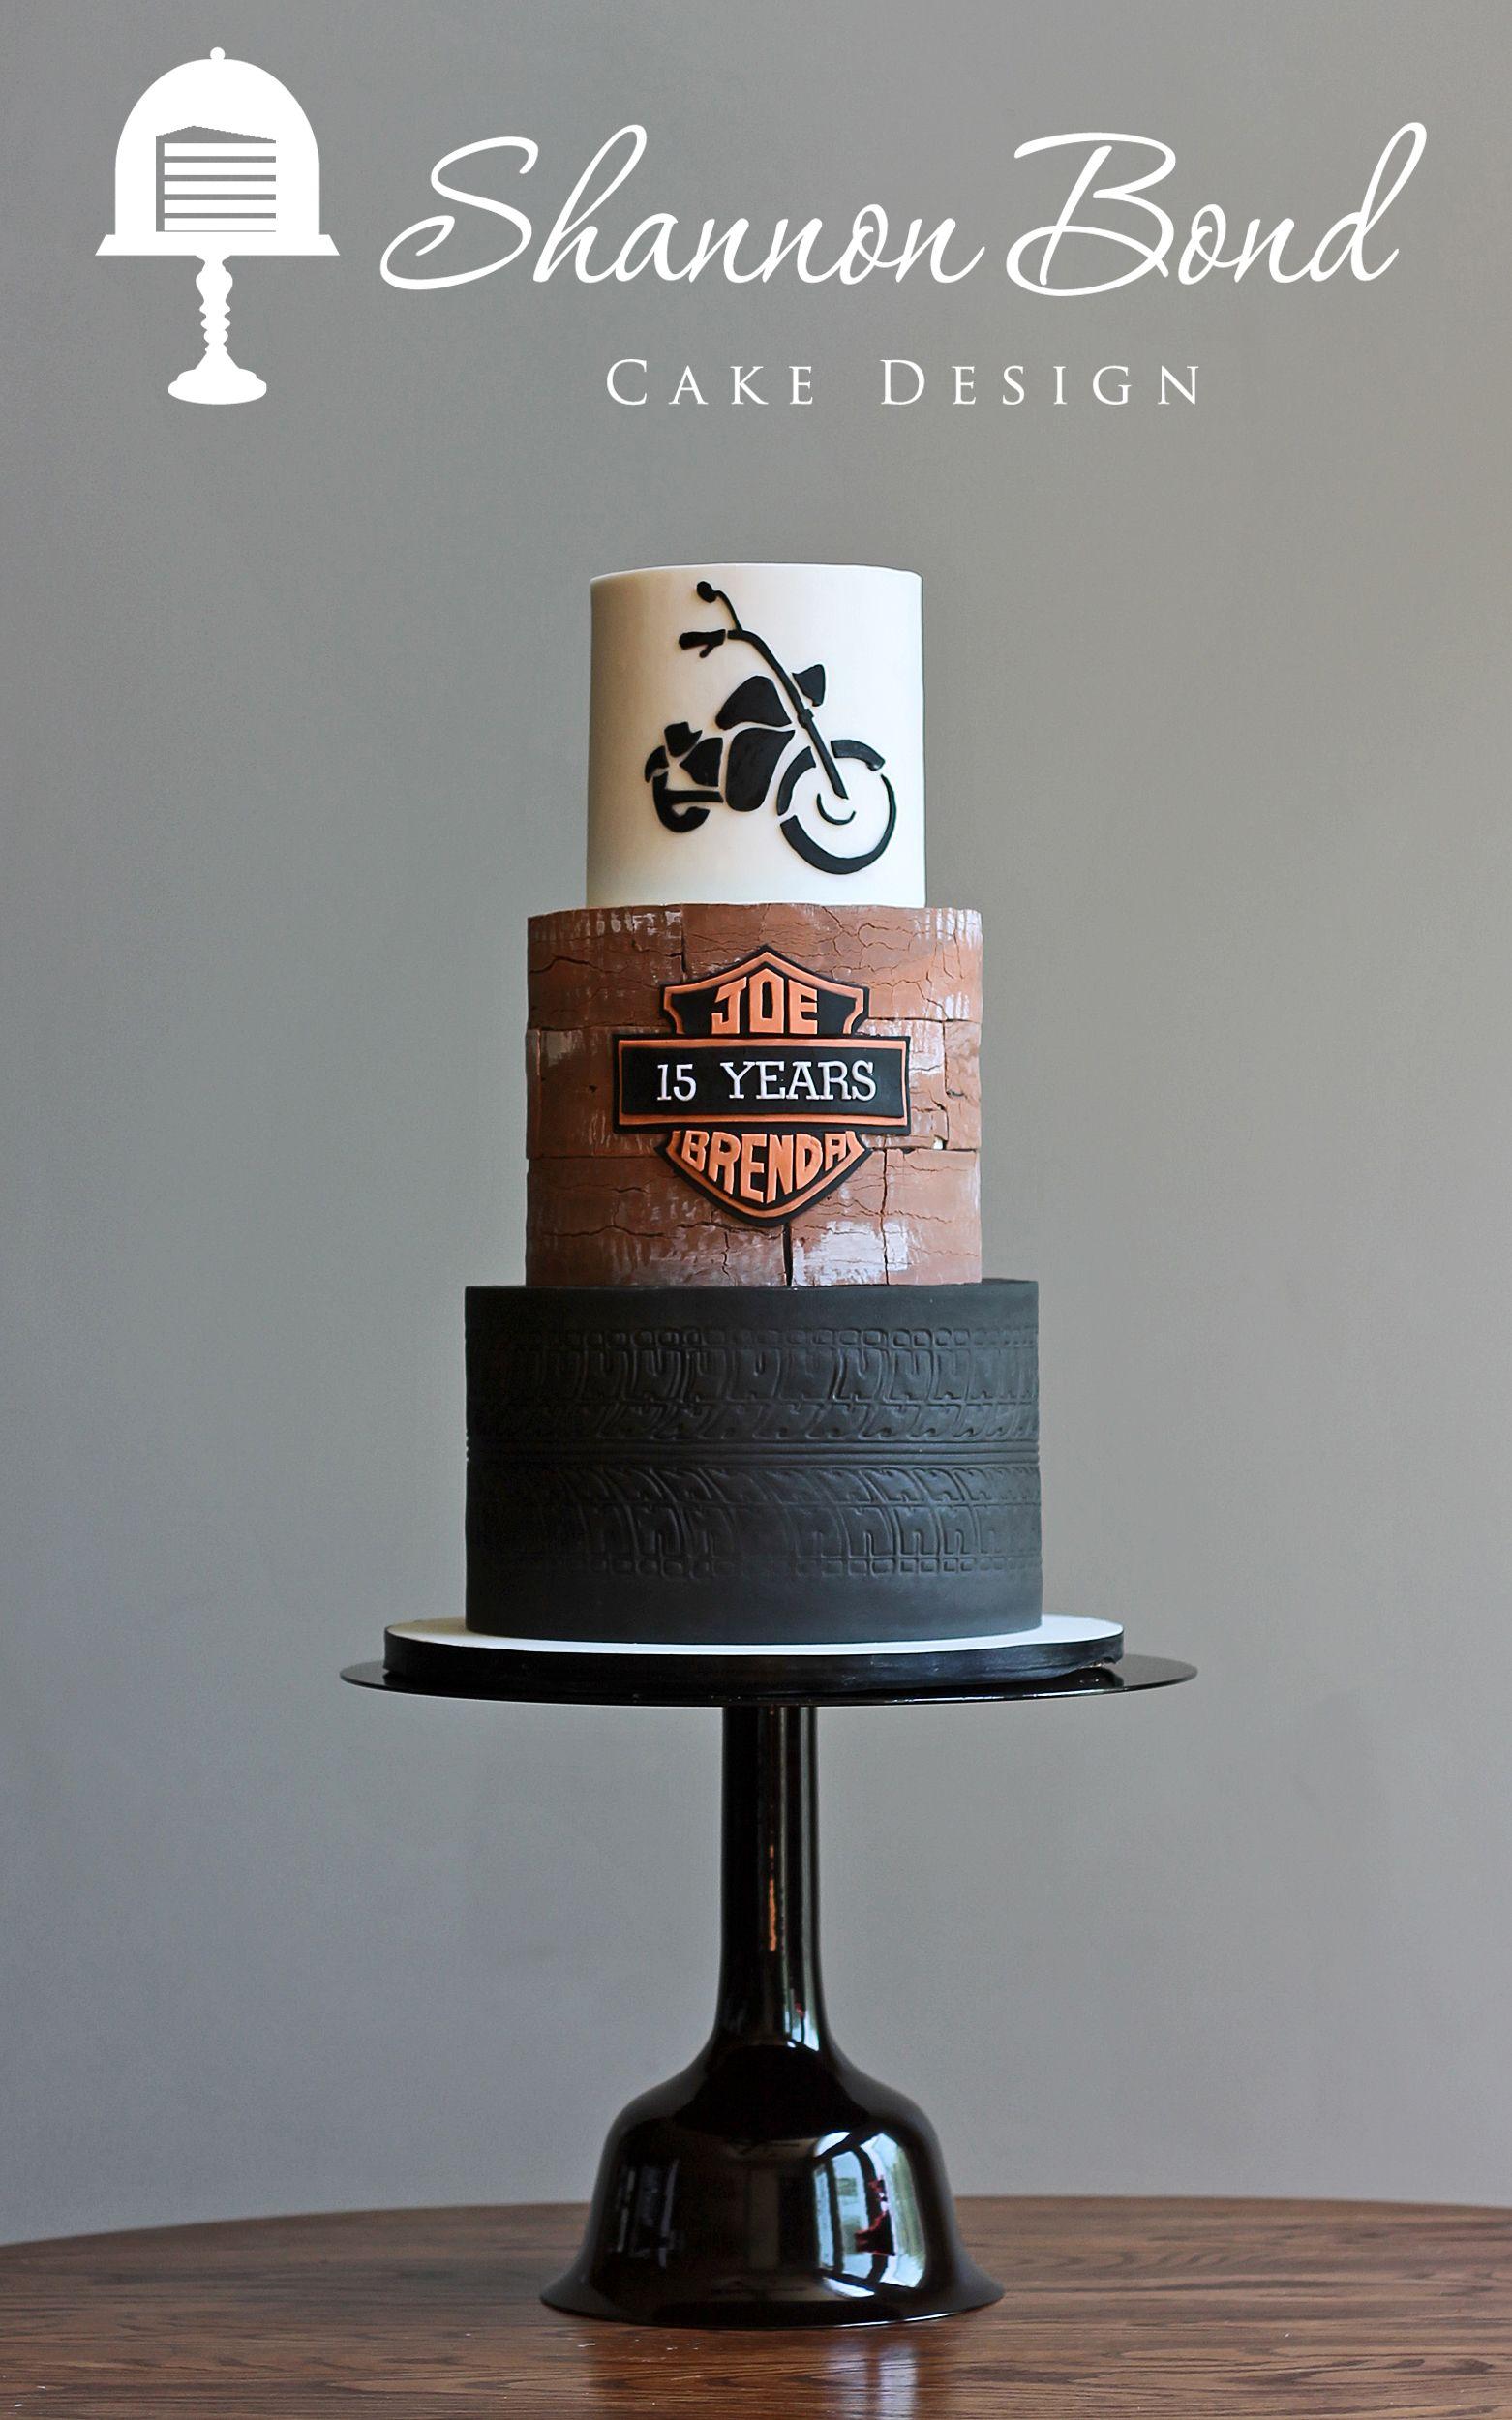 Motorcycle Anniversary Cake wwwsbcakedesigncom Shannon Bond Cake